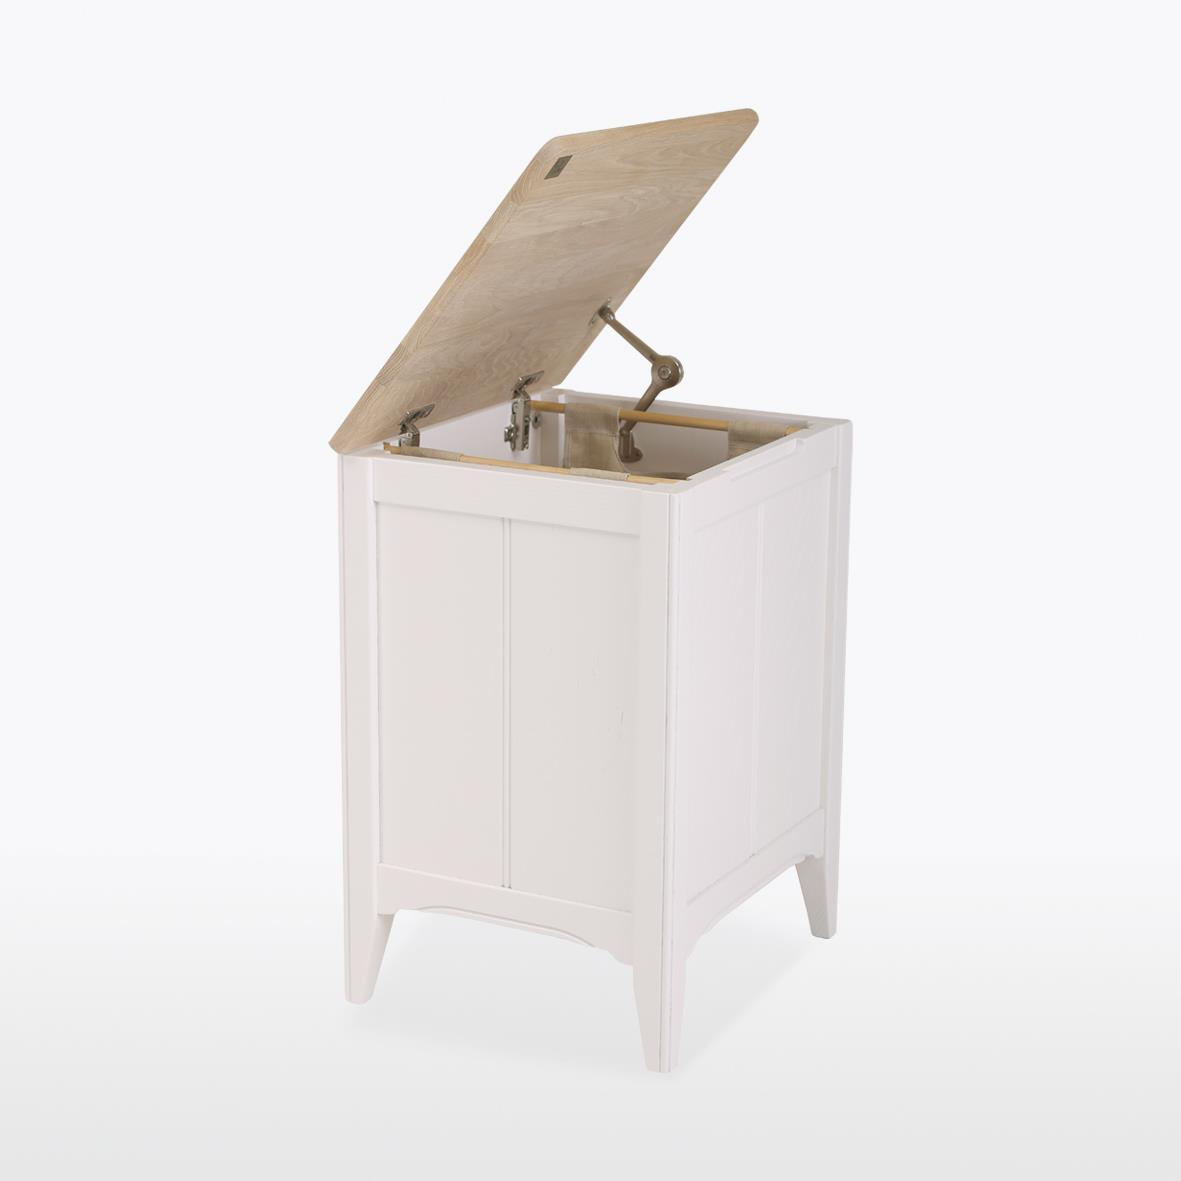 NEW ENGLAND - Laundry Chest NEL816